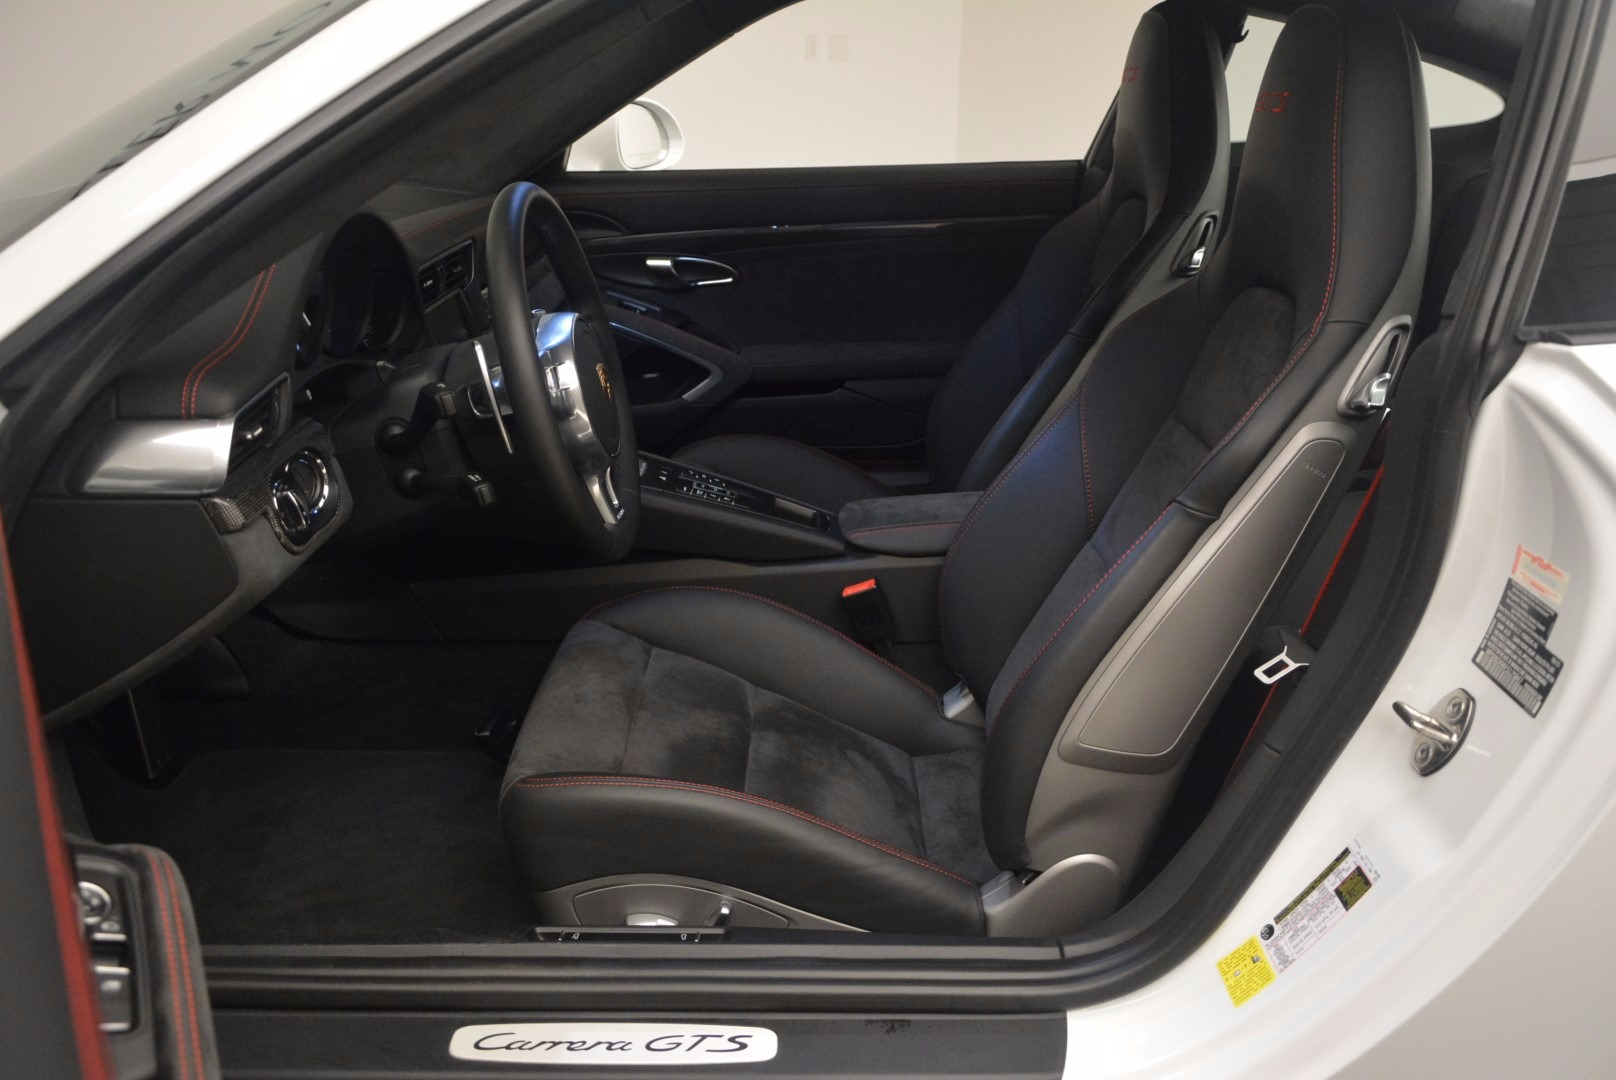 Used 2015 Porsche 911 Carrera GTS For Sale In Greenwich, CT 1444_p16